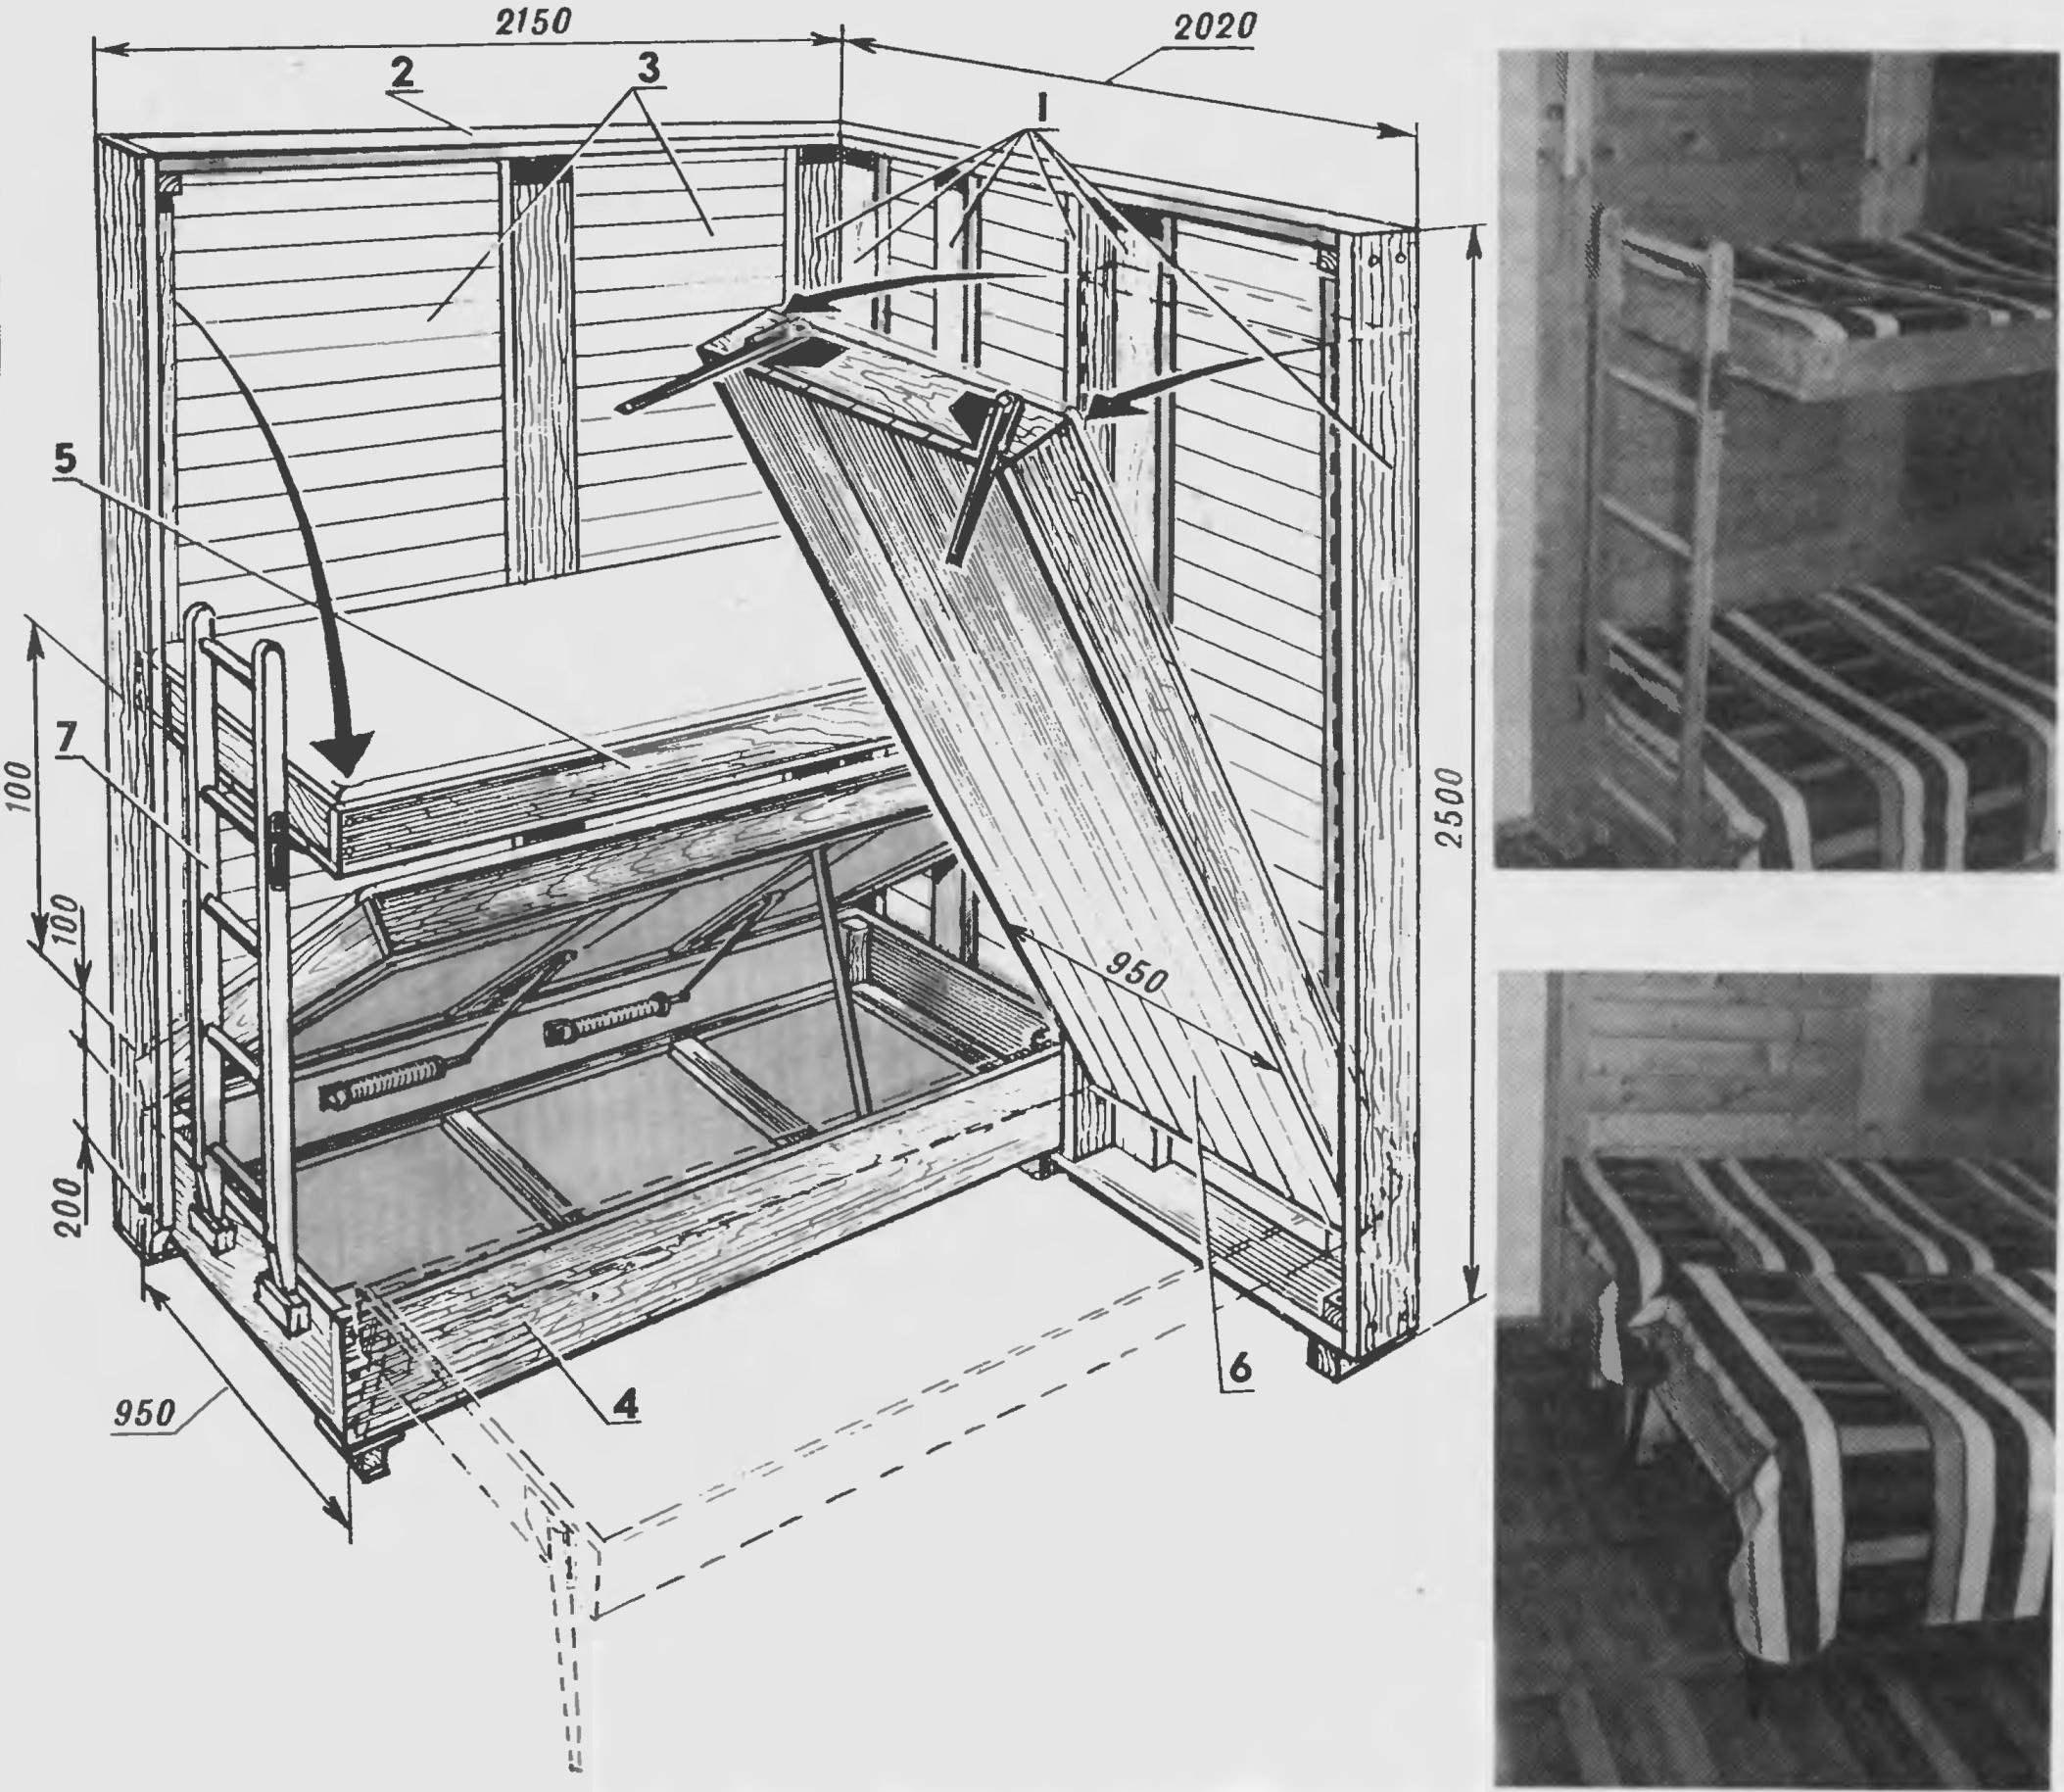 Fig. 10. Sleeping unit